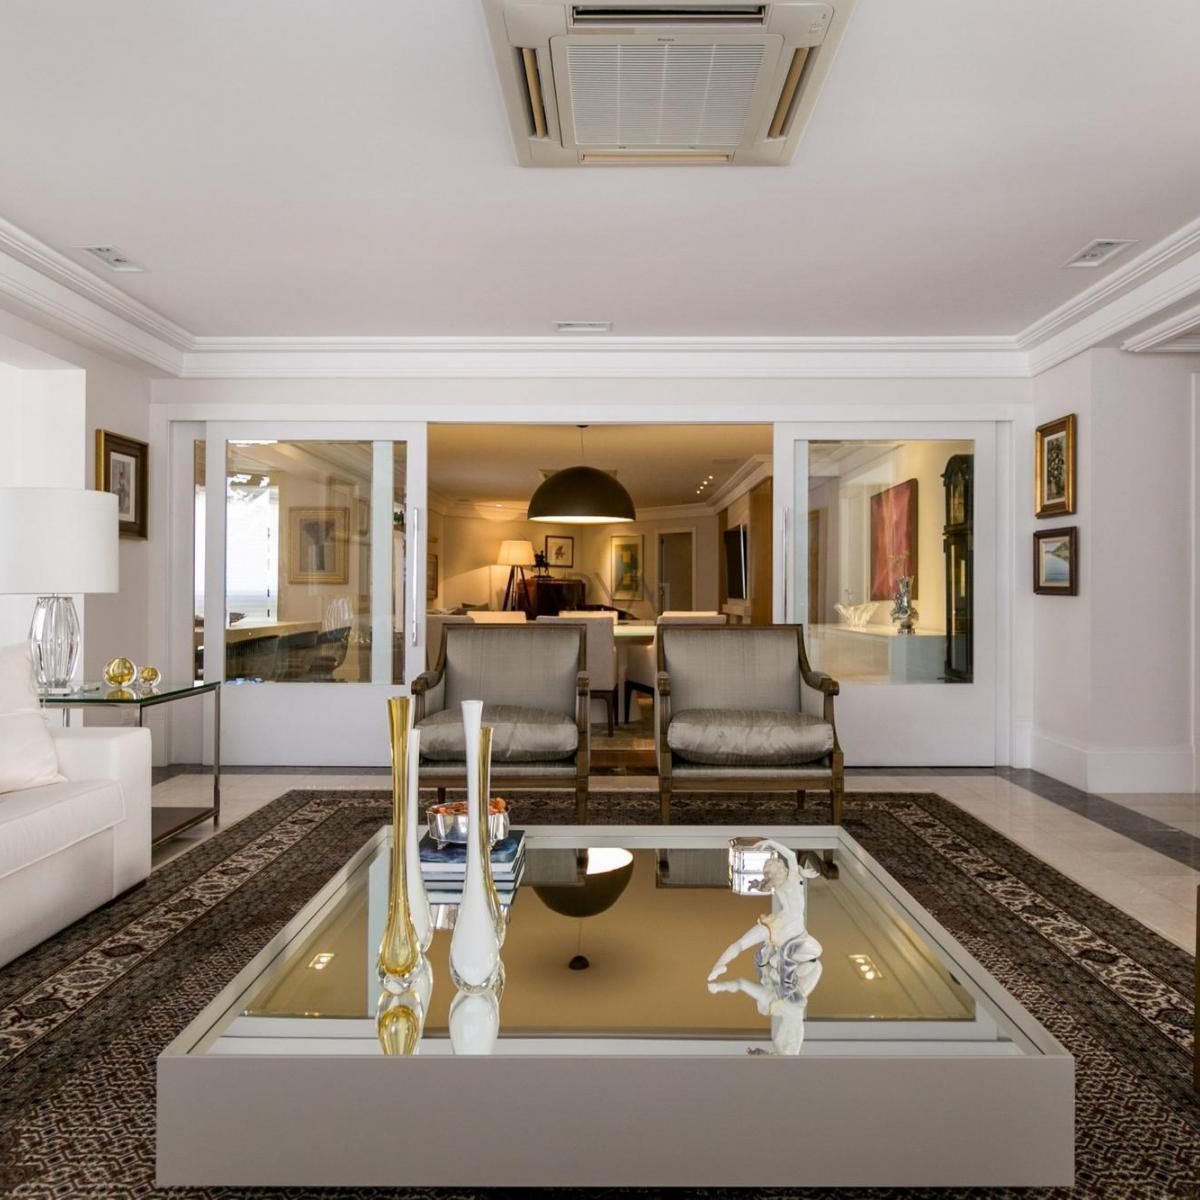 http://www.infocenterhost2.com.br/crm/fotosimovel/284951/84044384-apartamento-curitiba-ecoville.jpg